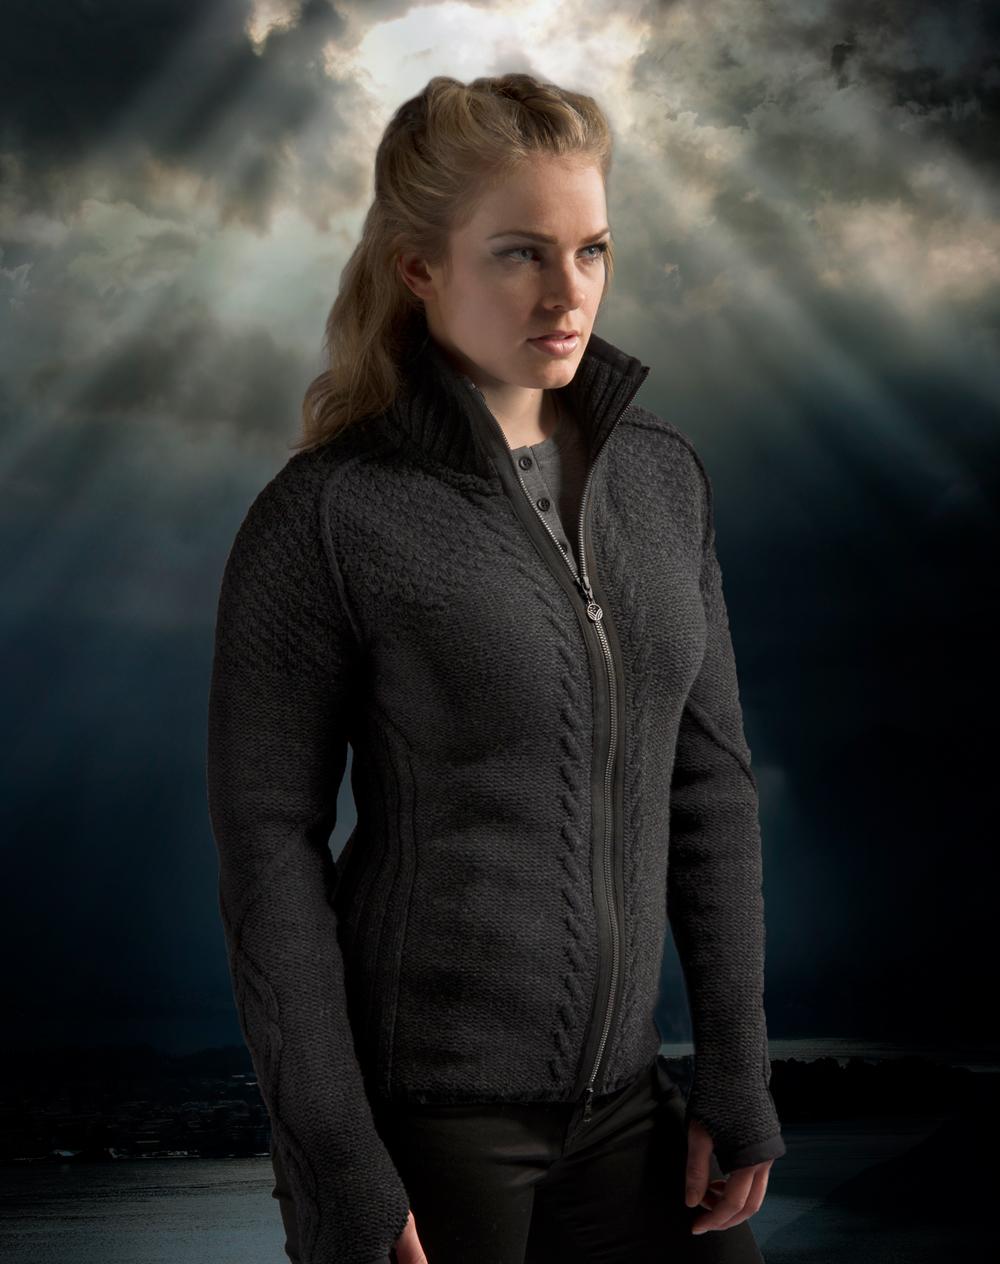 Viking Women's Jacket (1)